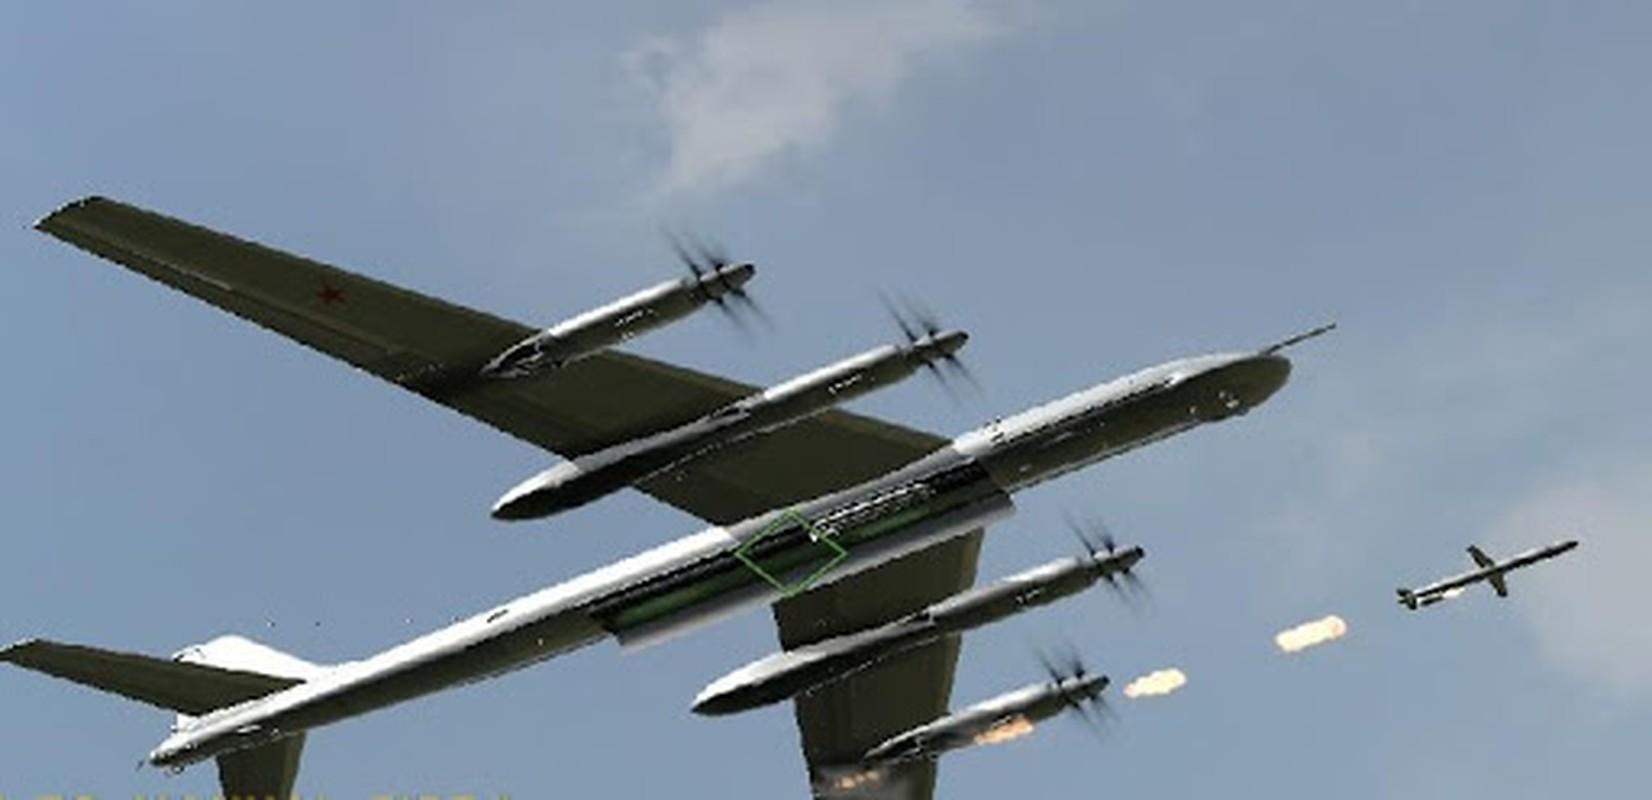 Tai sao Nga khong dung may bay nem bom chien luoc Tu-95 o Syria?-Hinh-16